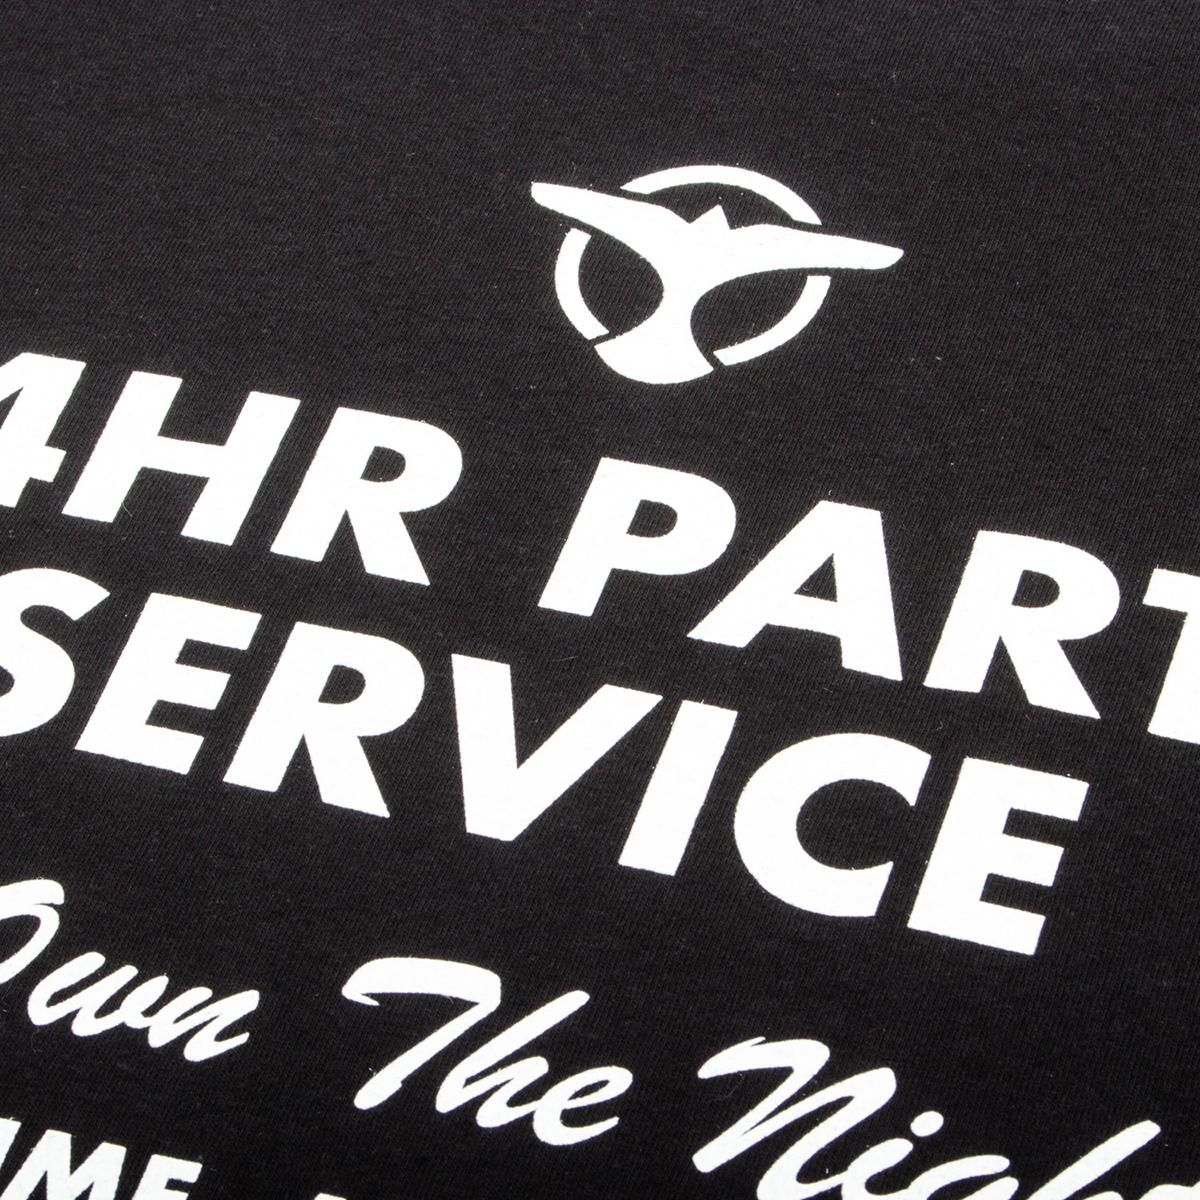 '24 HR PARTY' T-Shirt